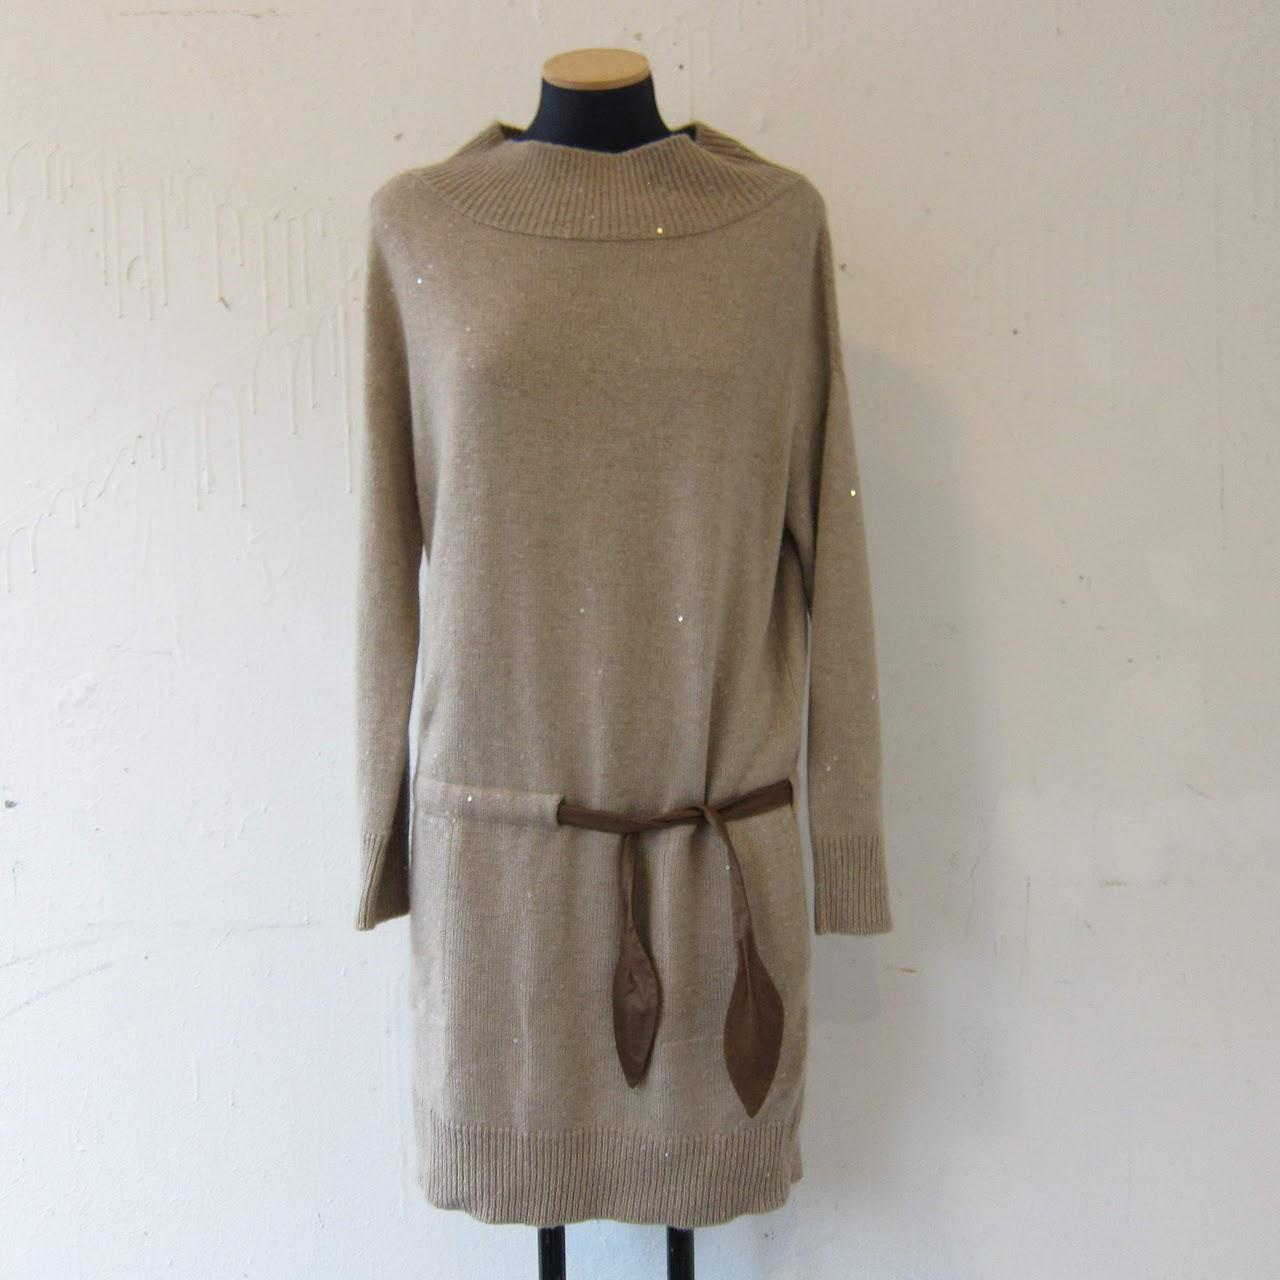 Silk Brunello Sweater Cashmereamp; DressShophousingworks Cucinelli Yfgyb76v